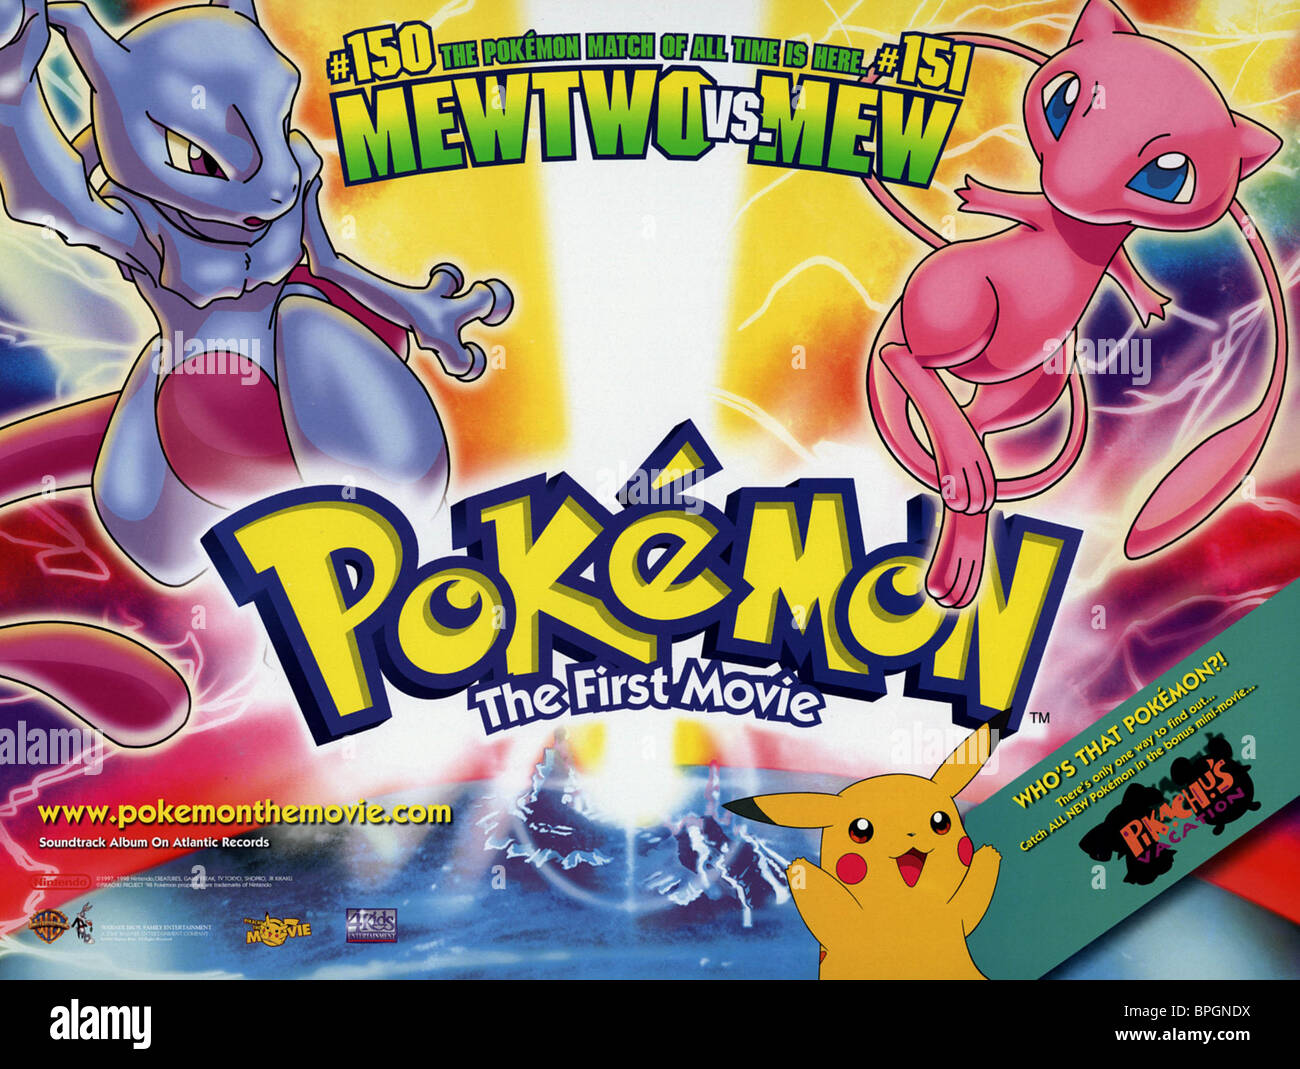 film poster pokemon the first movie 1999 stock photo 31100886 alamy